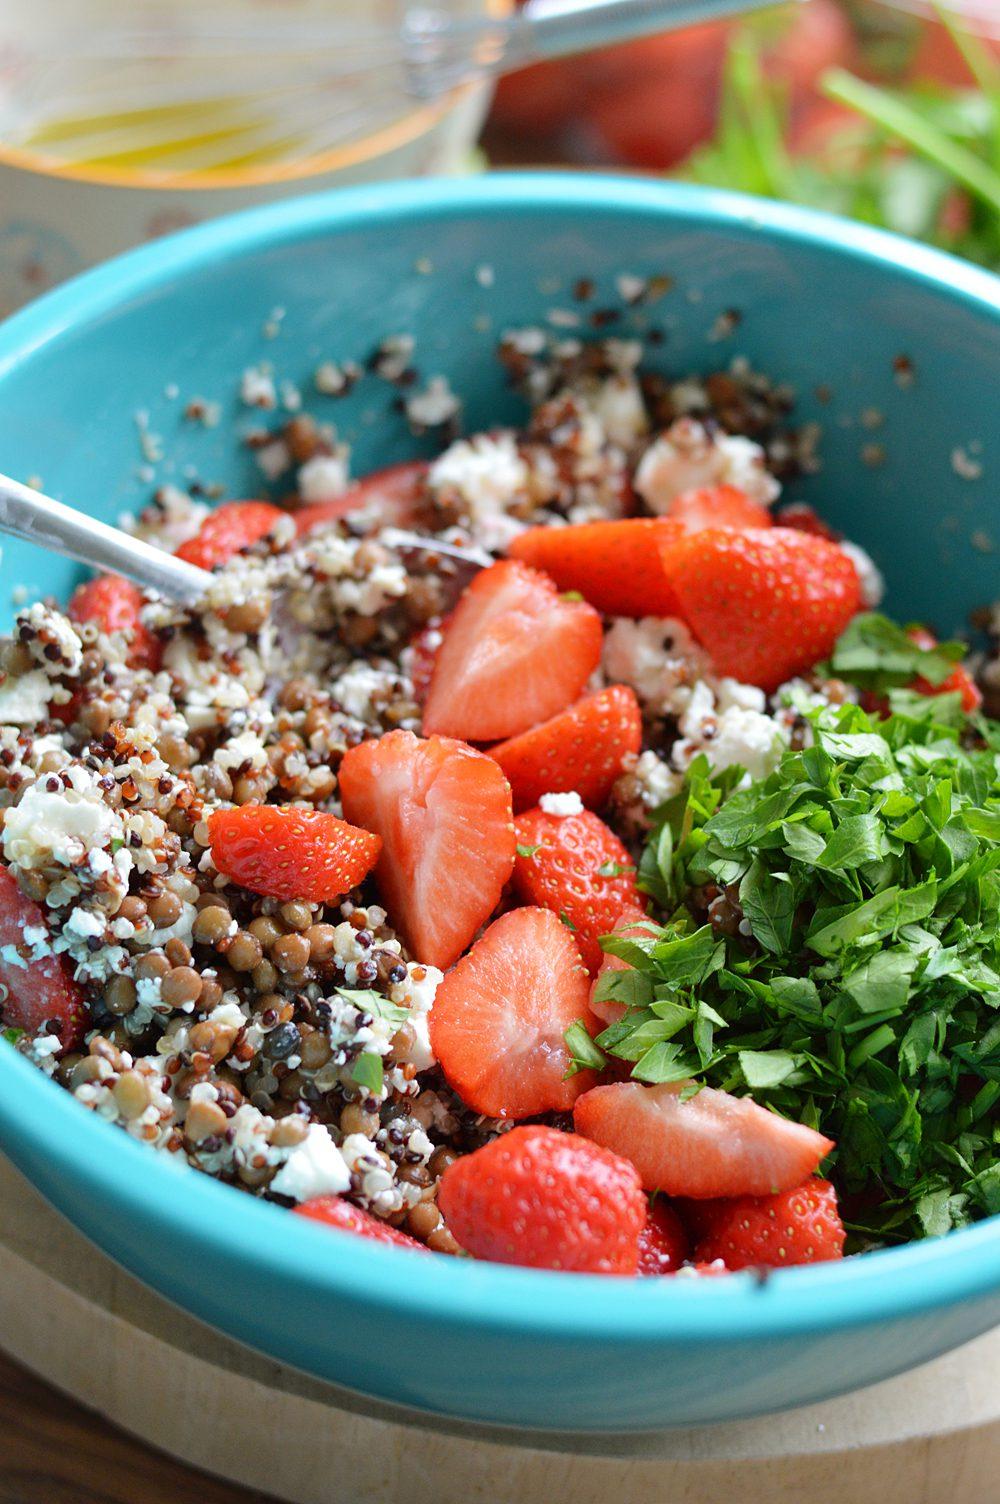 feta strawberry salad with lentils and quinoa